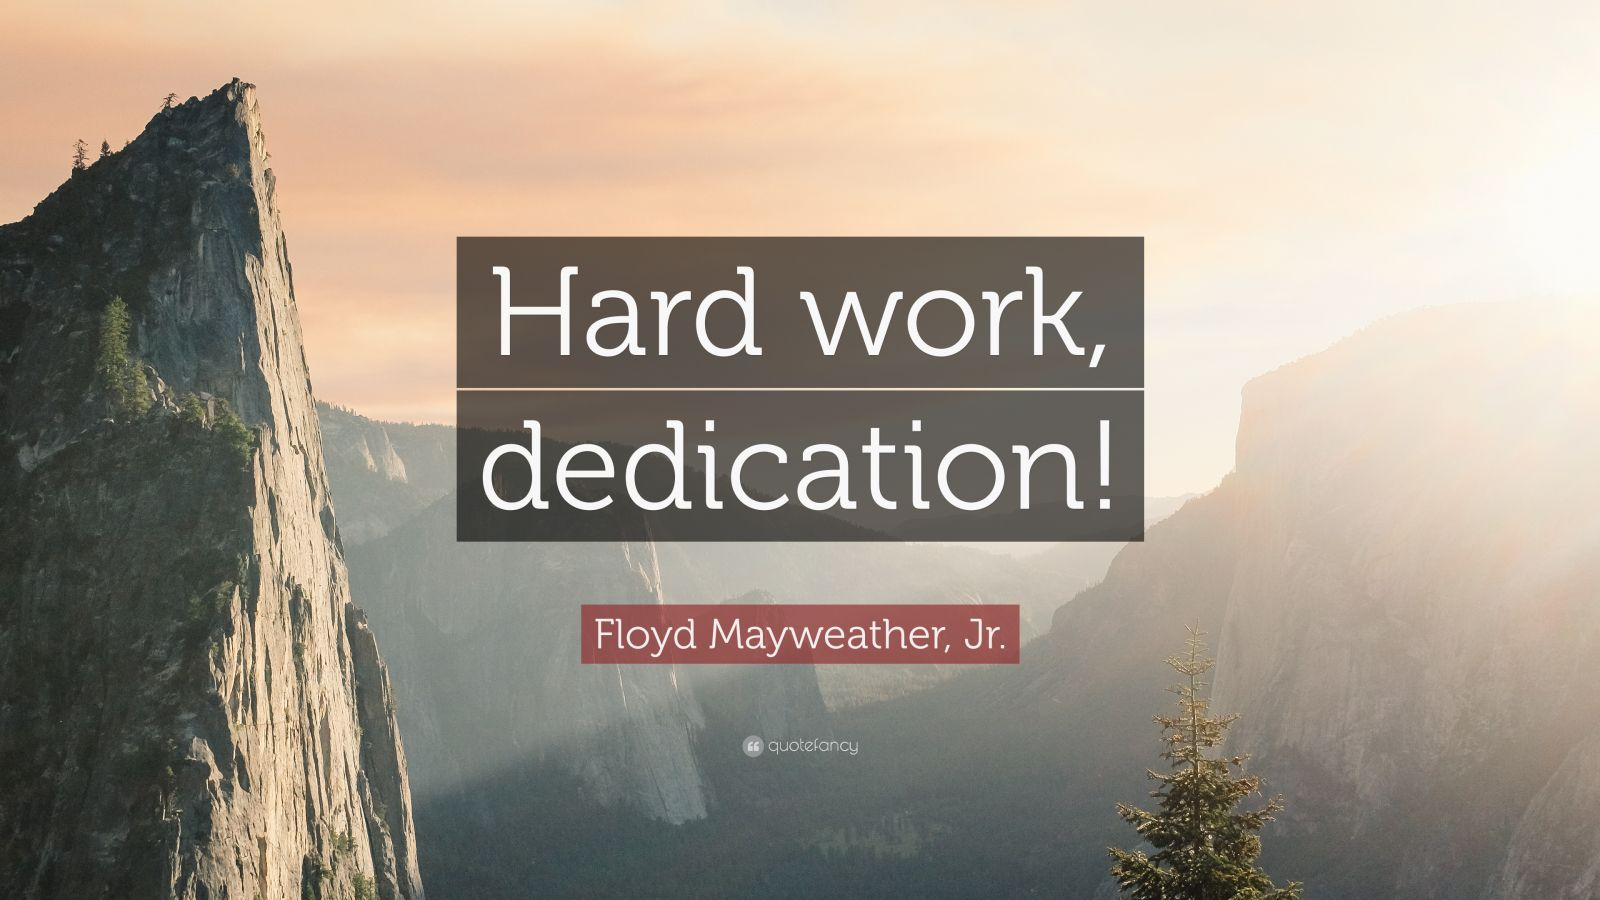 Steve Jobs Motivational Quotes Wallpaper Floyd Mayweather Jr Quote Hard Work Dedication 12